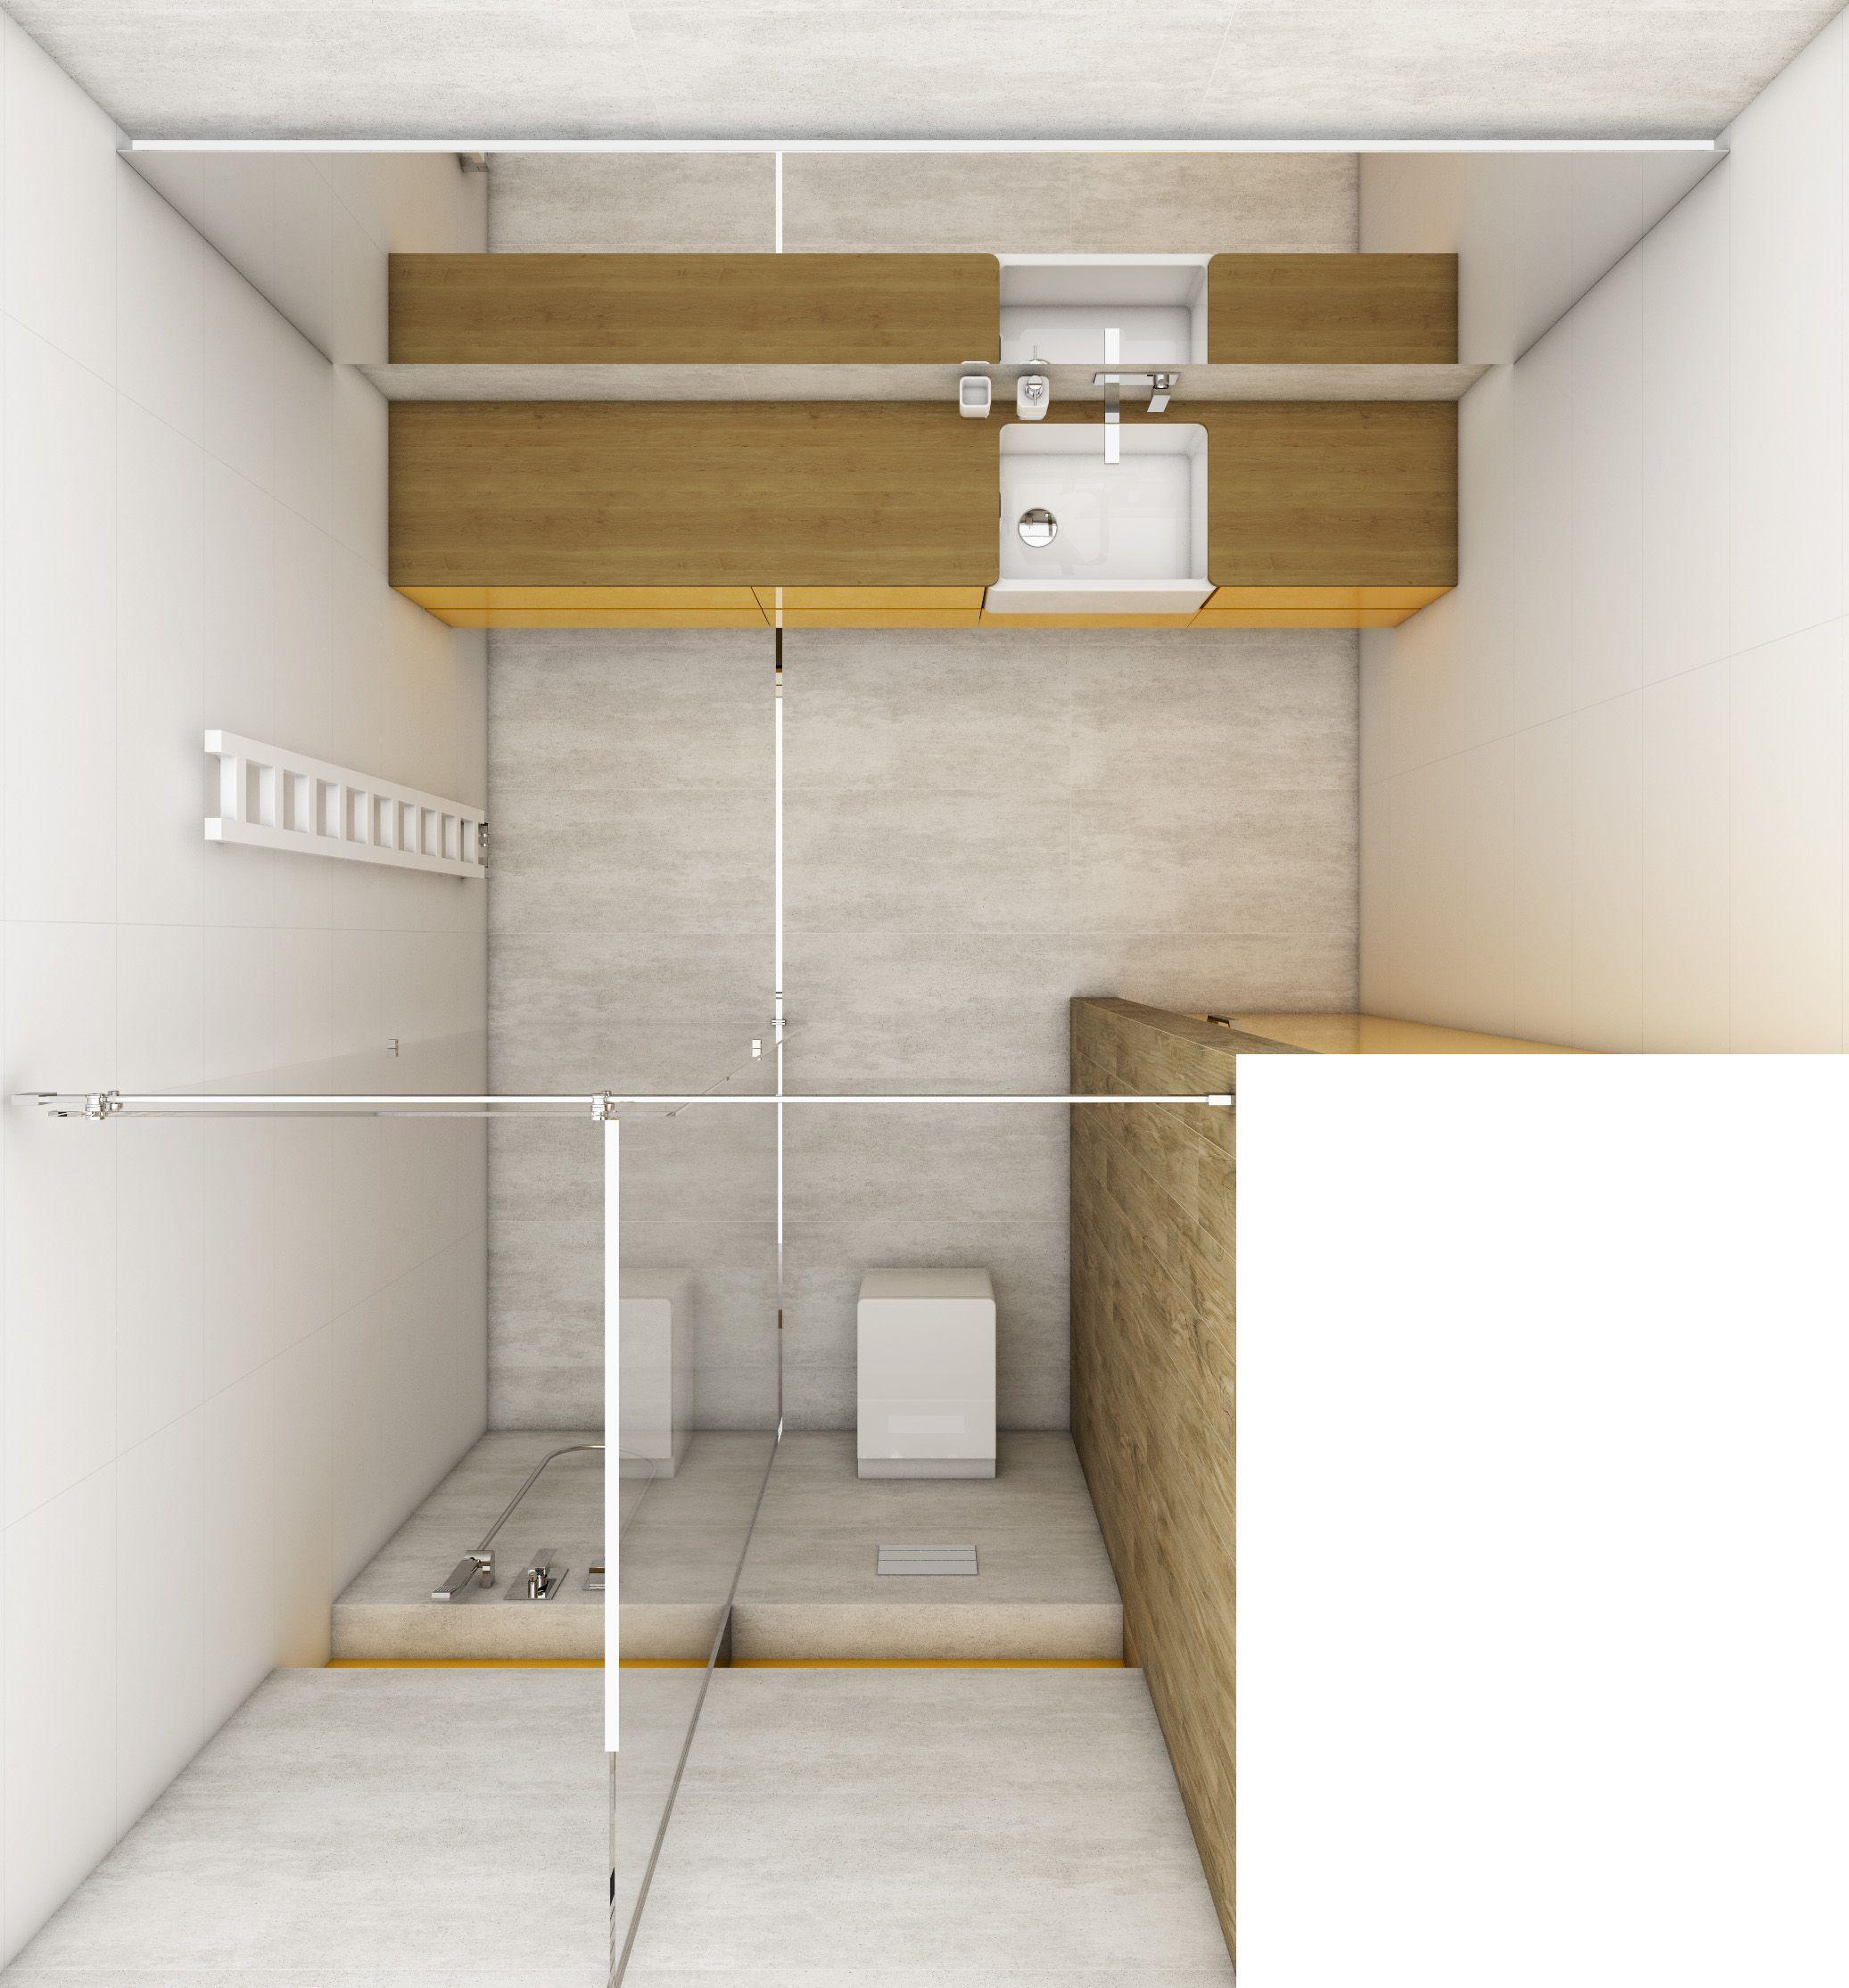 Modular Bathroom - Floor Plan